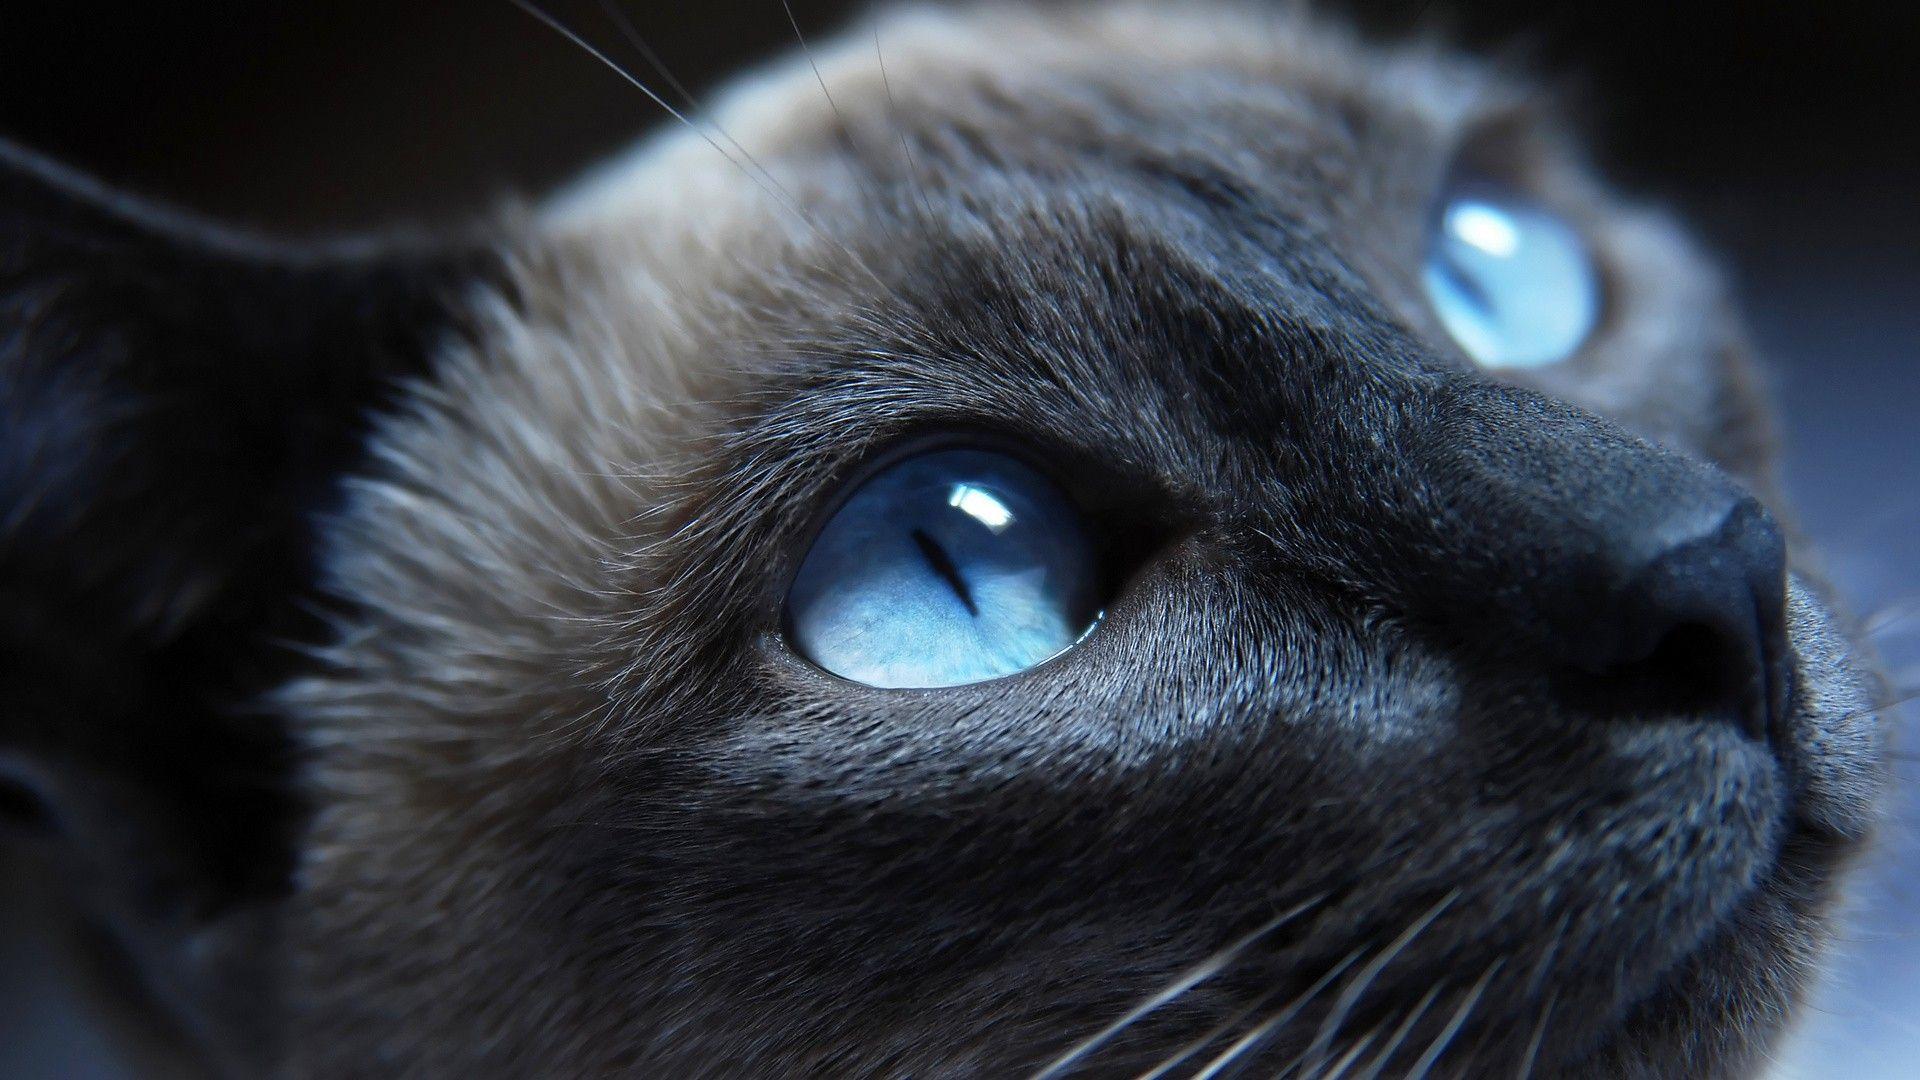 Fond Ecran Animal Gratuit Chat Yeux Bleu Regard Wallpaper Hd Cats